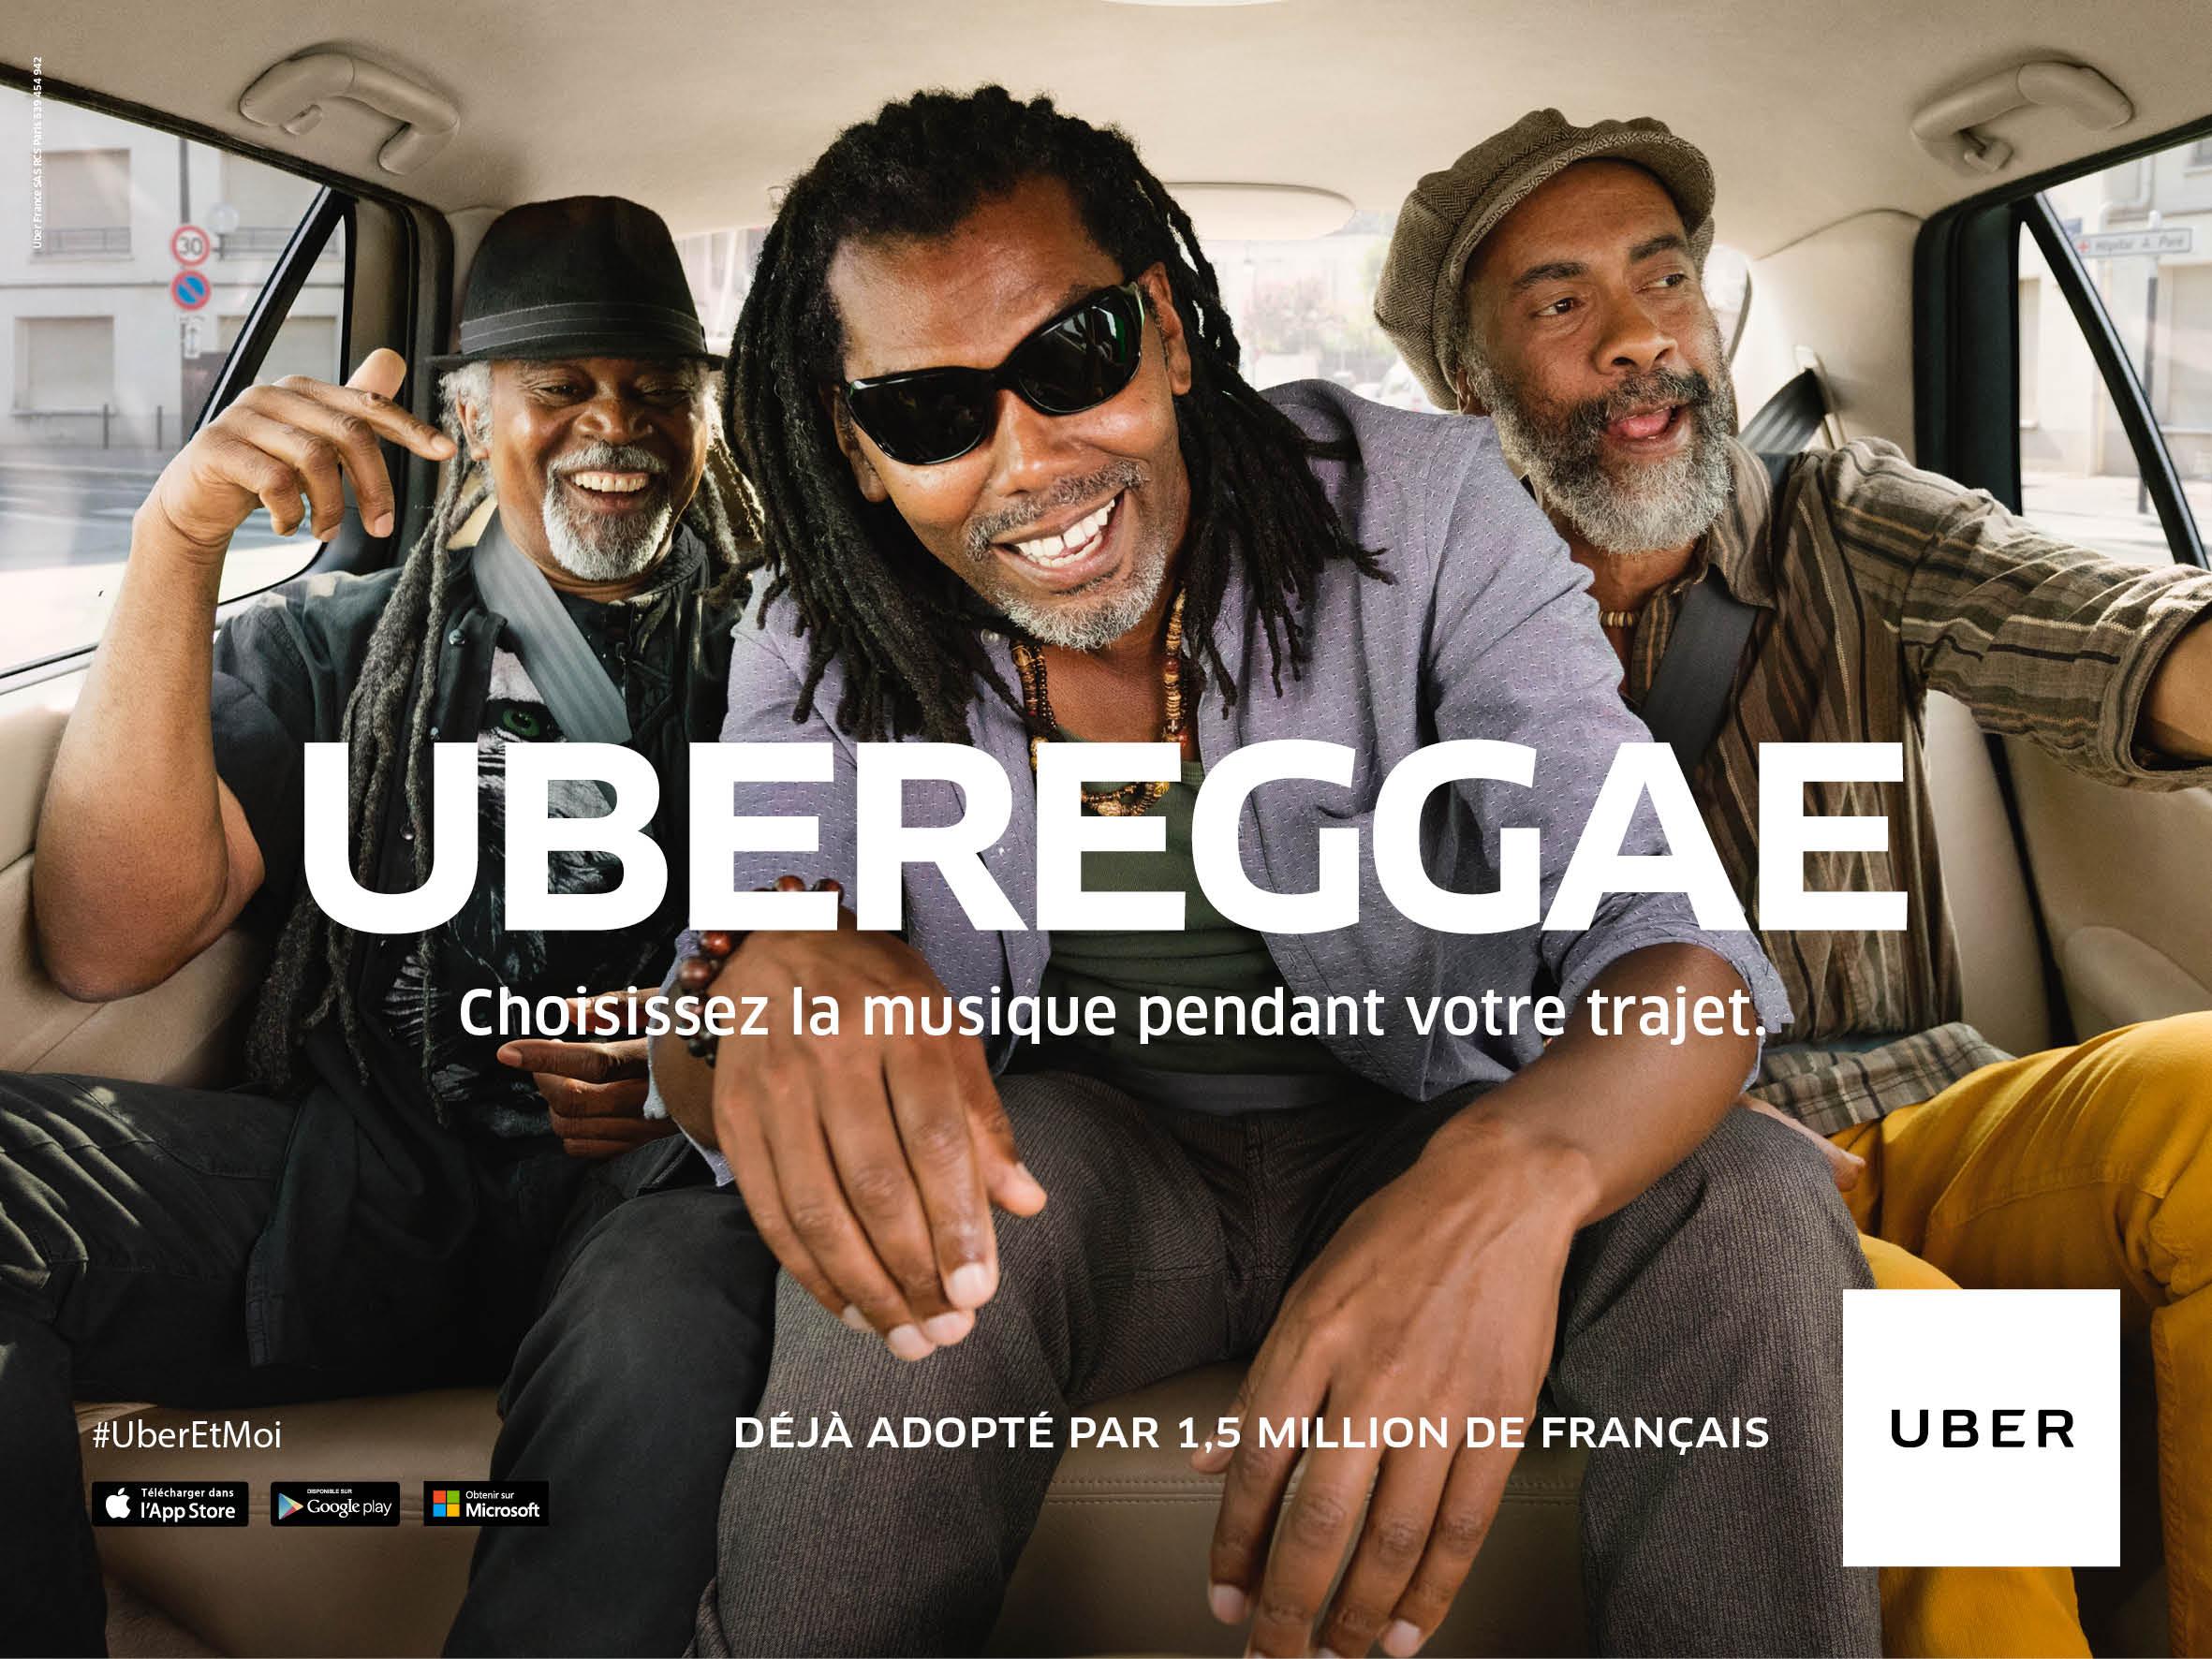 uber-france-publicite-marketing-application-utilisateurs-passagers-mars-2016-agence-marcel-publicis-5